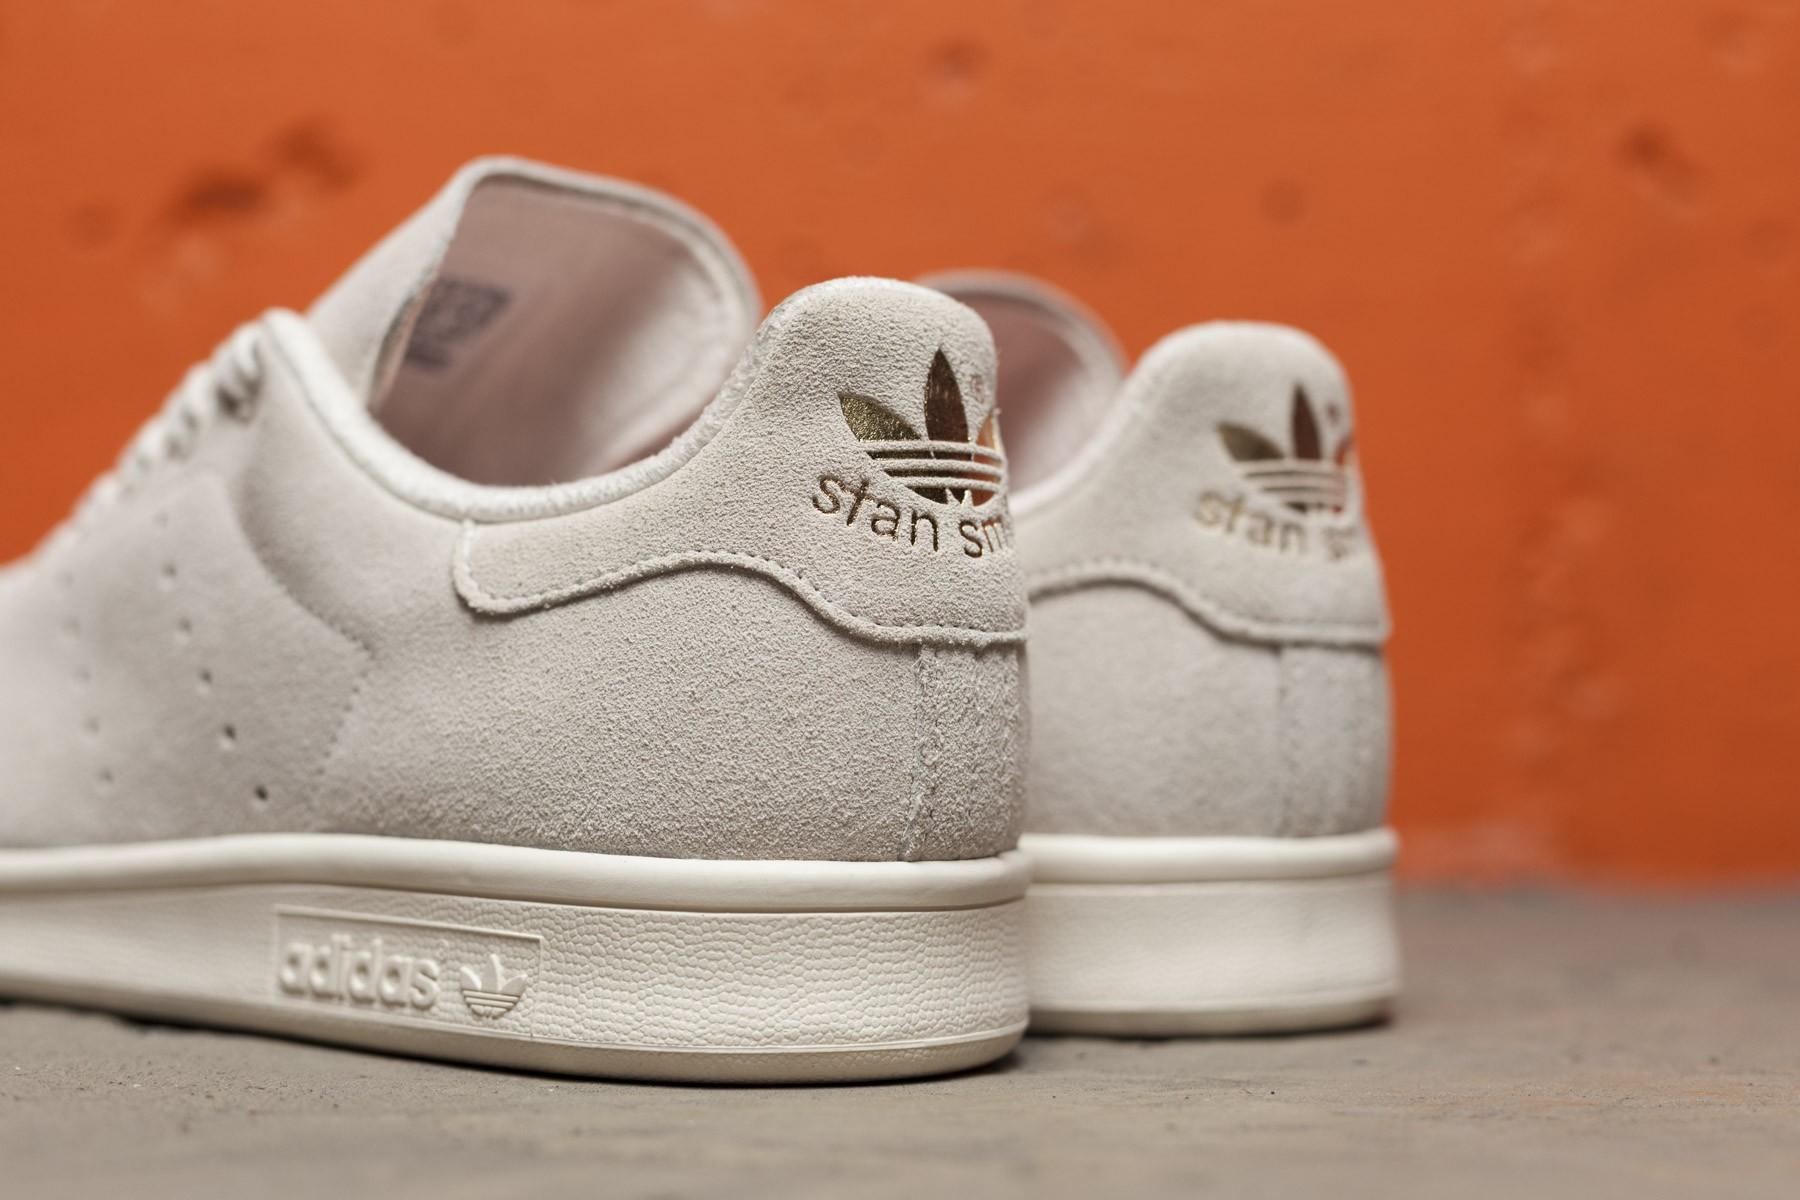 adidas off white suede stan smith